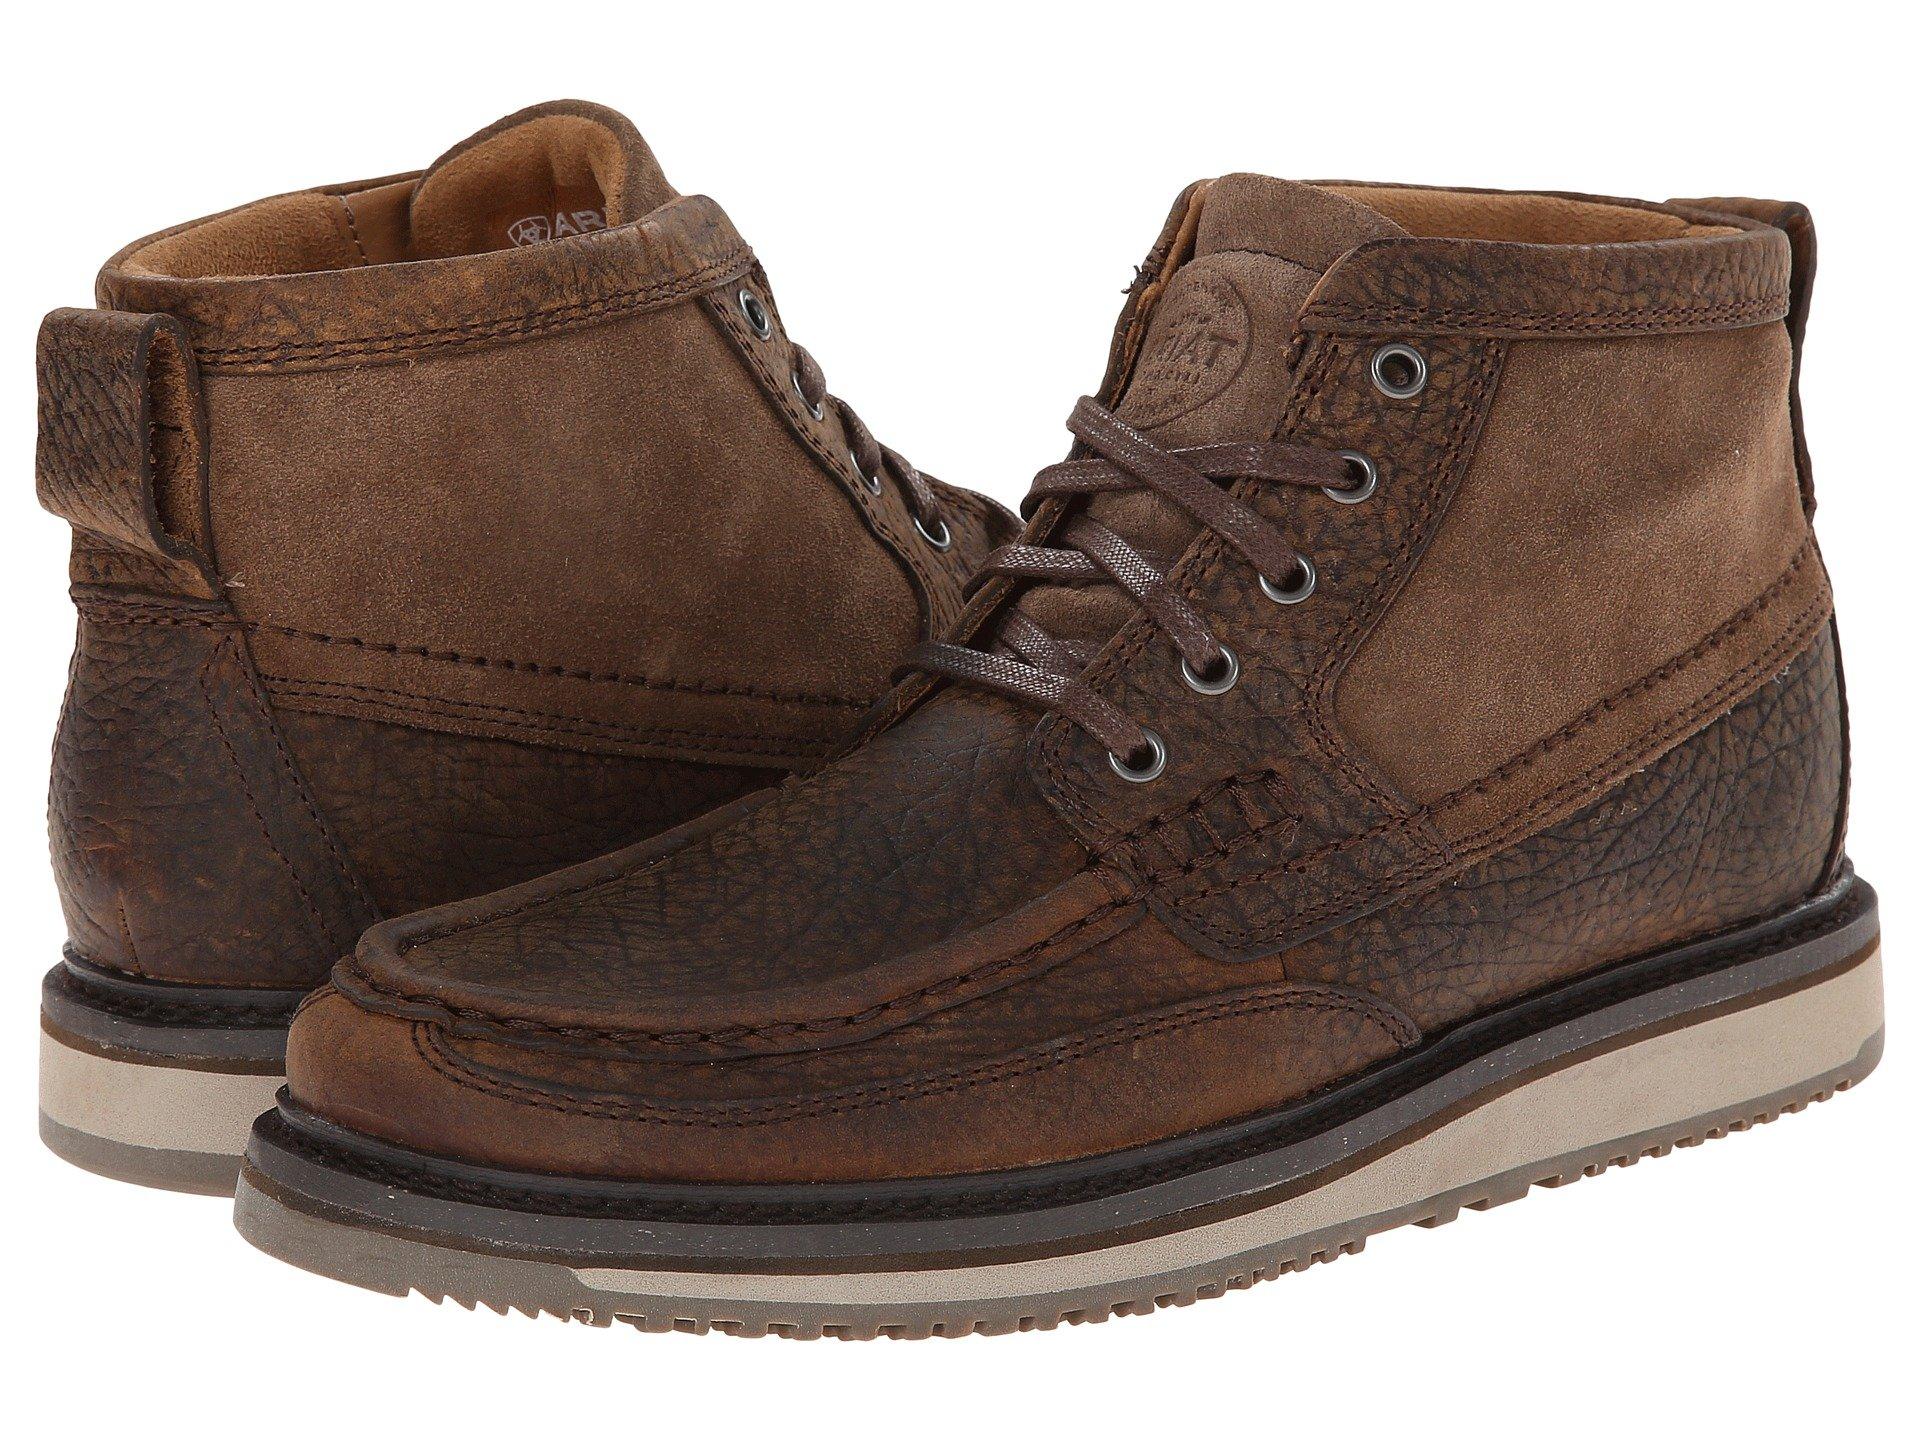 Mens Moc Toe Boots Free Shipping Shoes Zapposcom